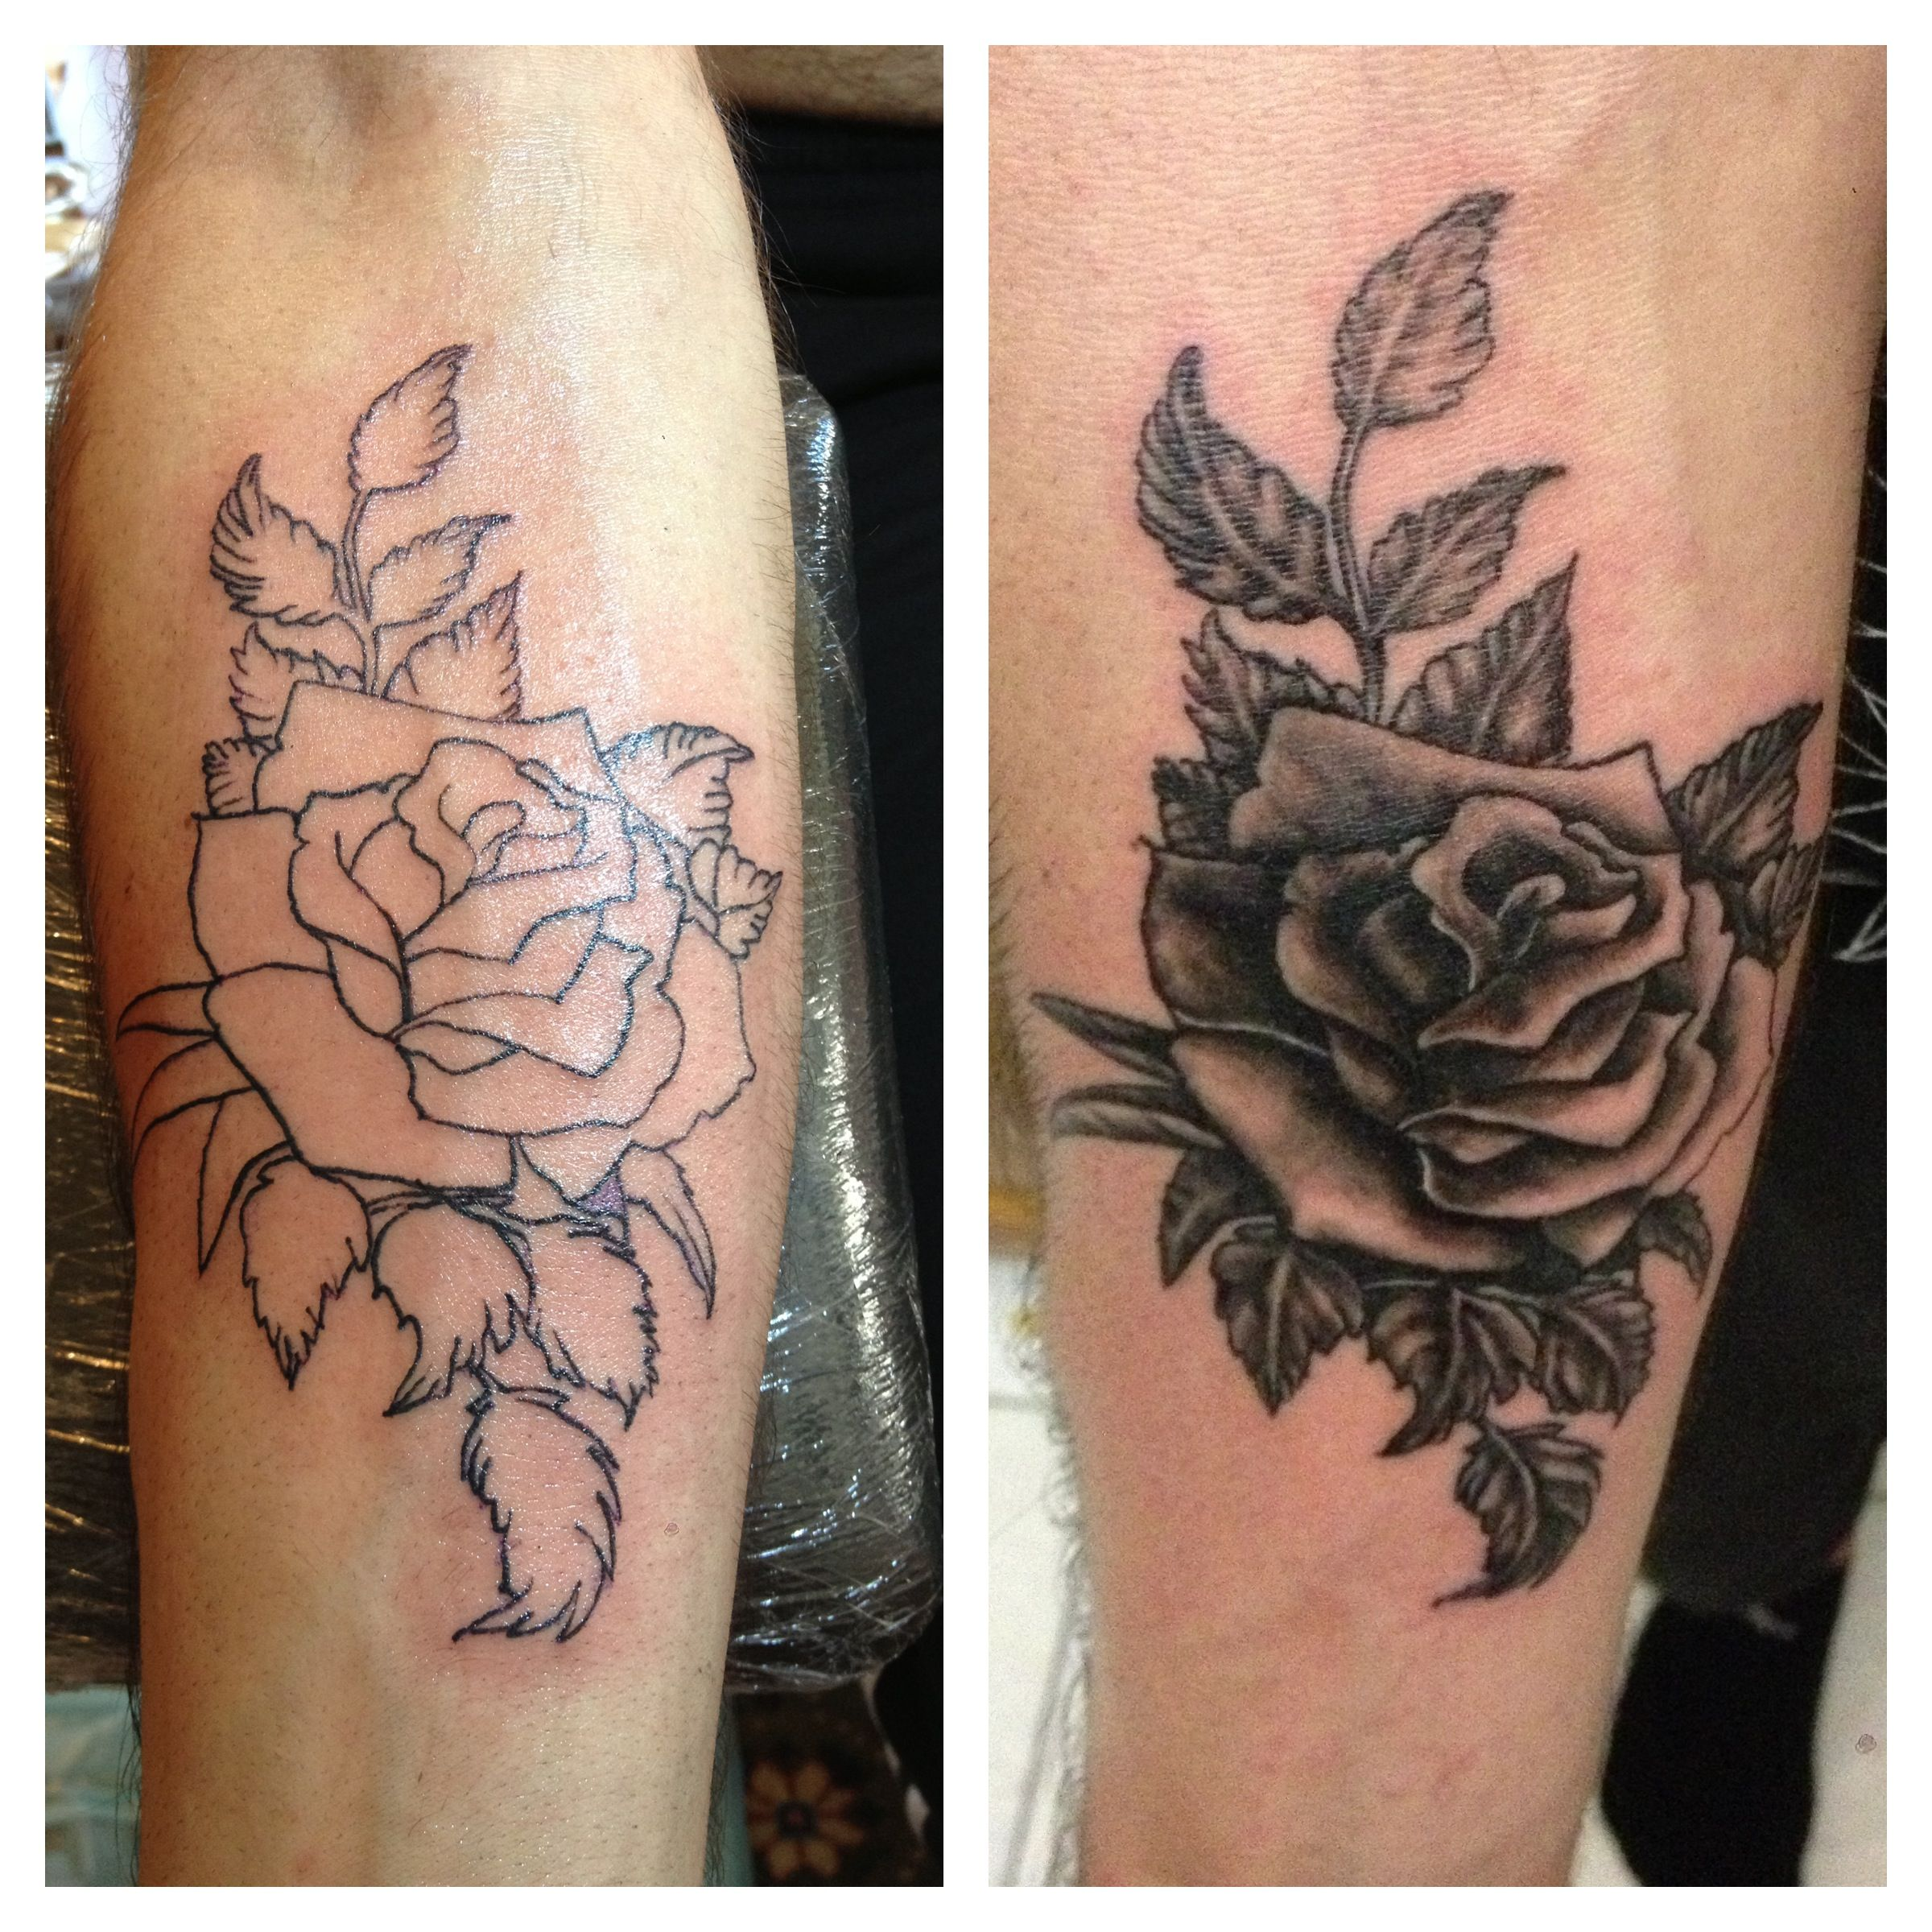 Tattoo Art Black And White: Black And White Rose Tattoo